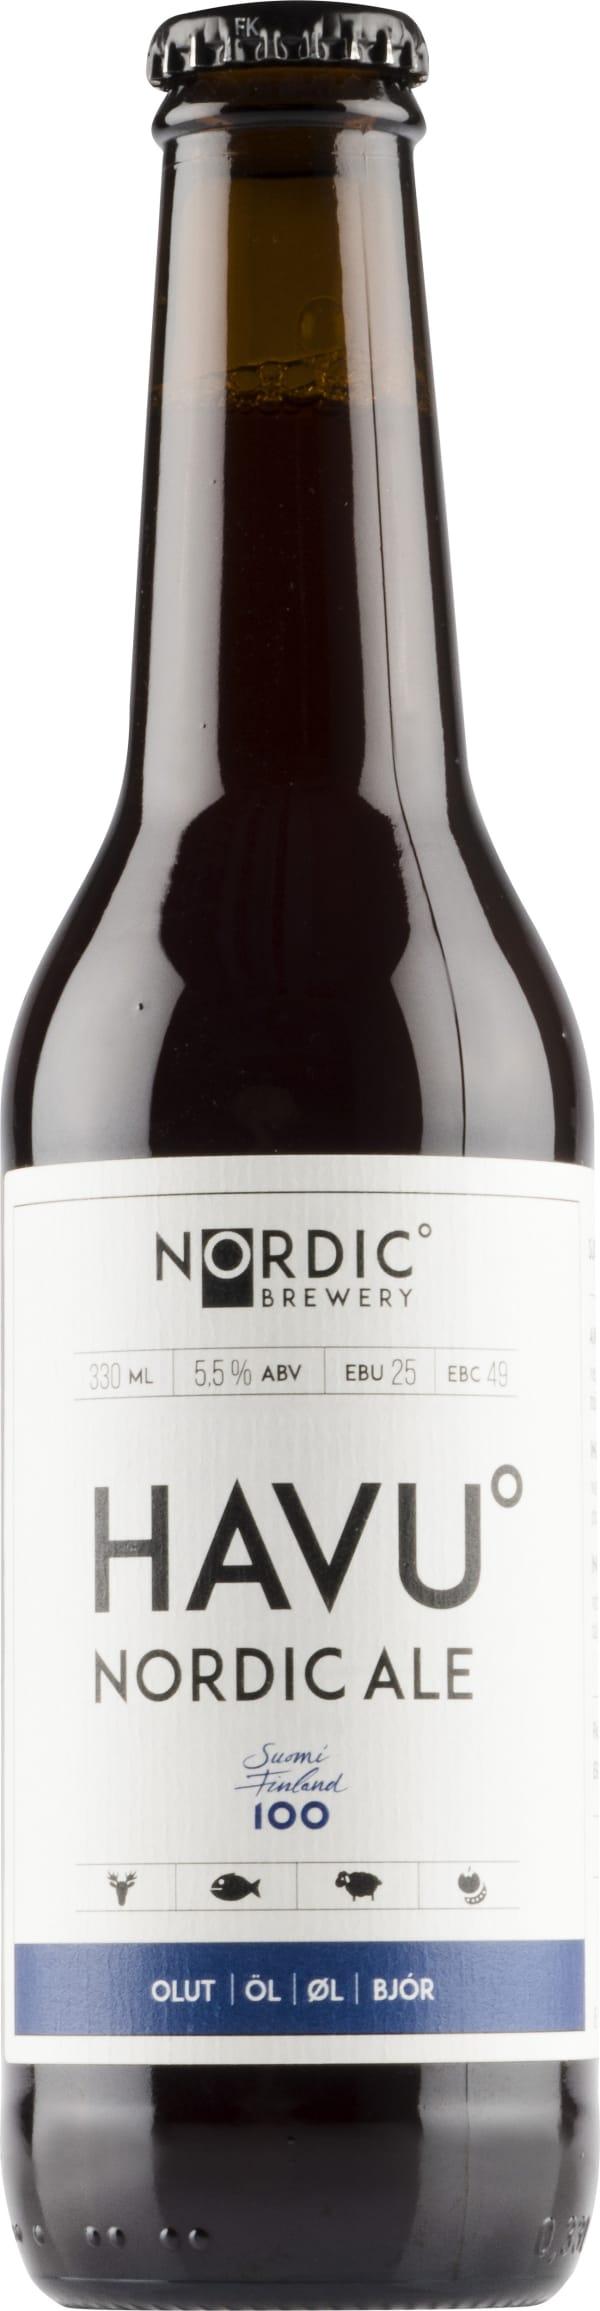 Nordic Brewery Havu